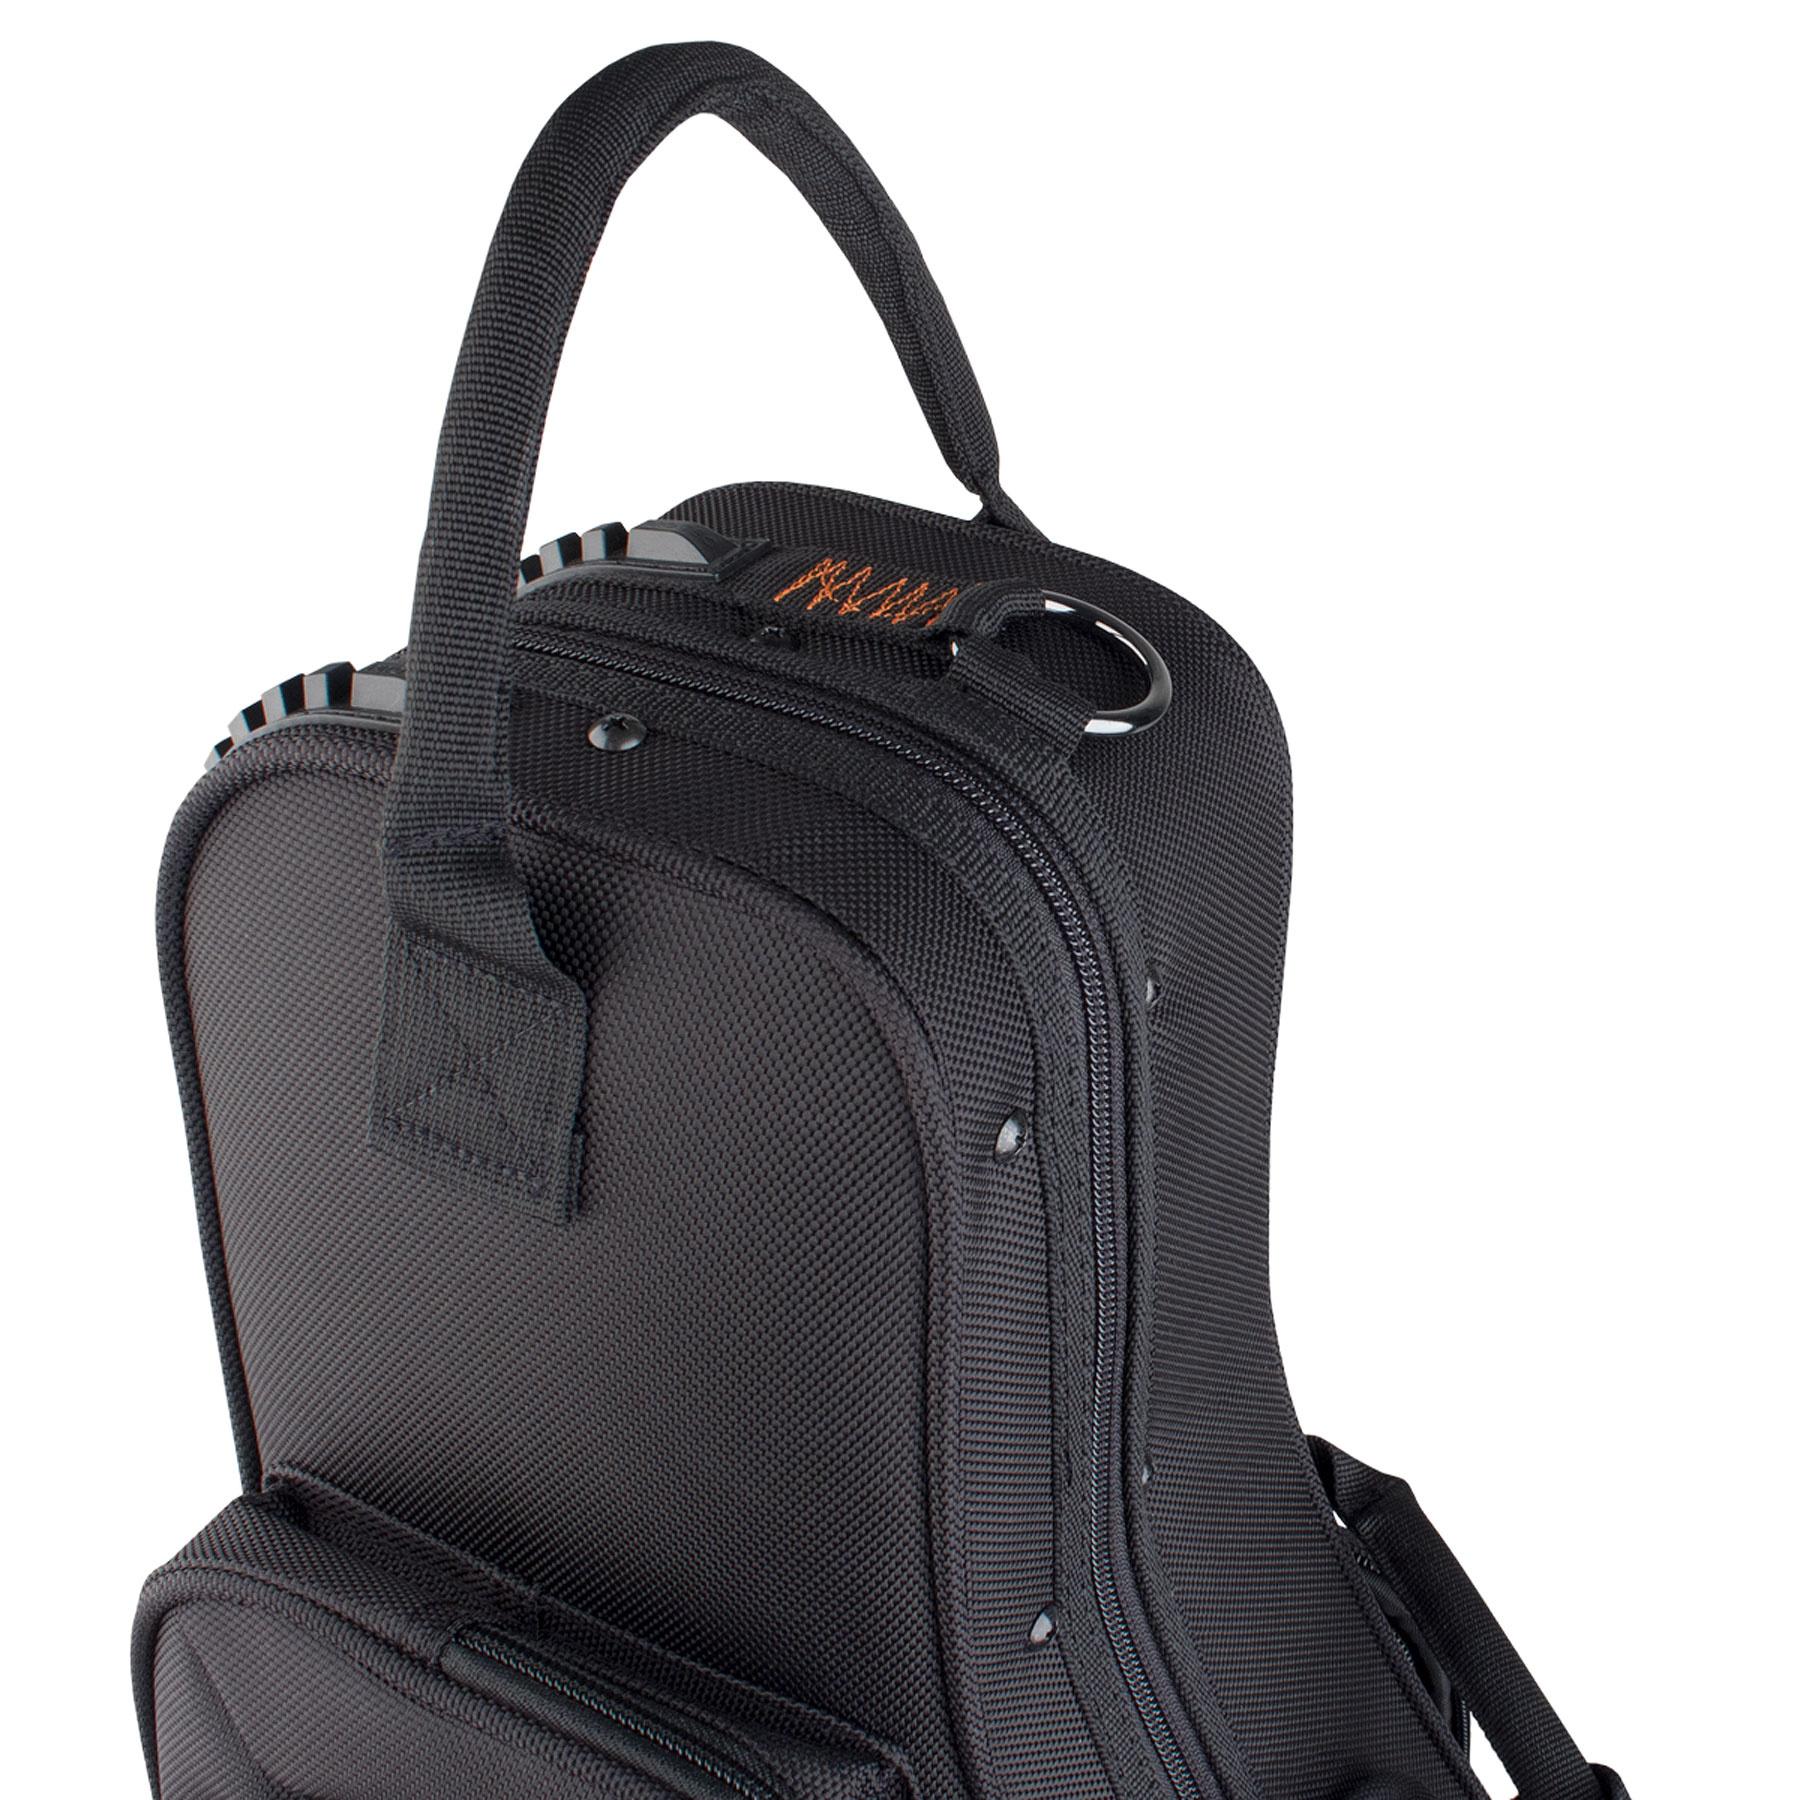 Protec Protec Pro Pac XL Contoured Alto Sax Case